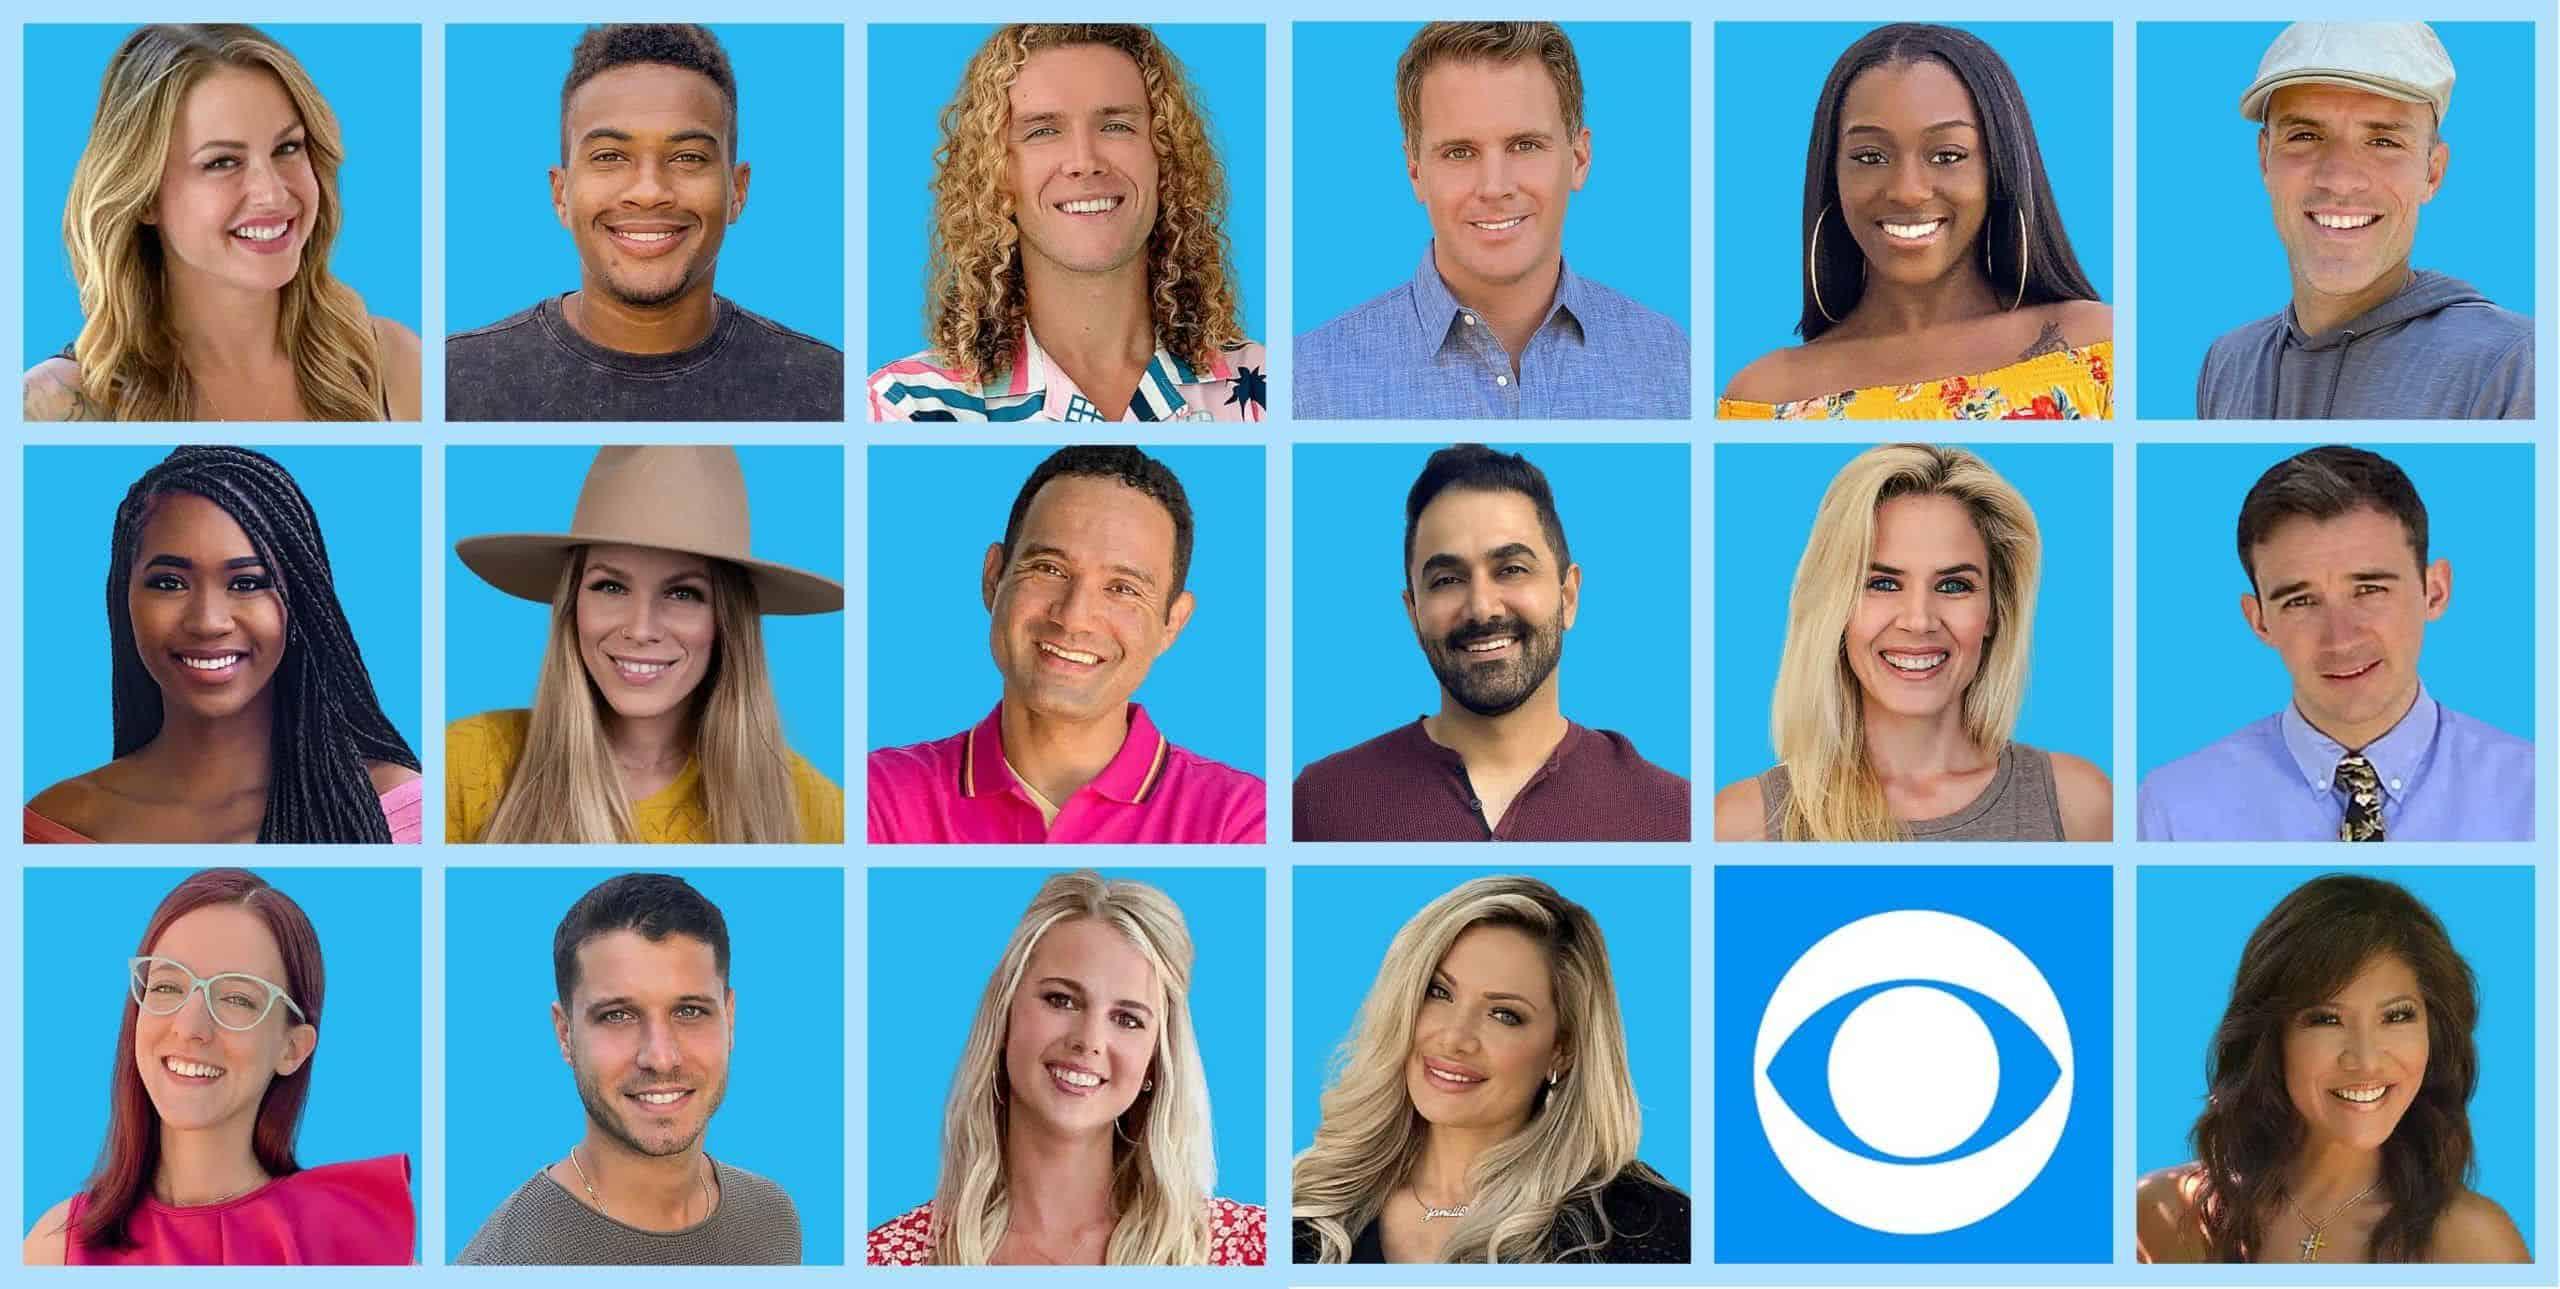 Elenco do Big Brother americano 2020